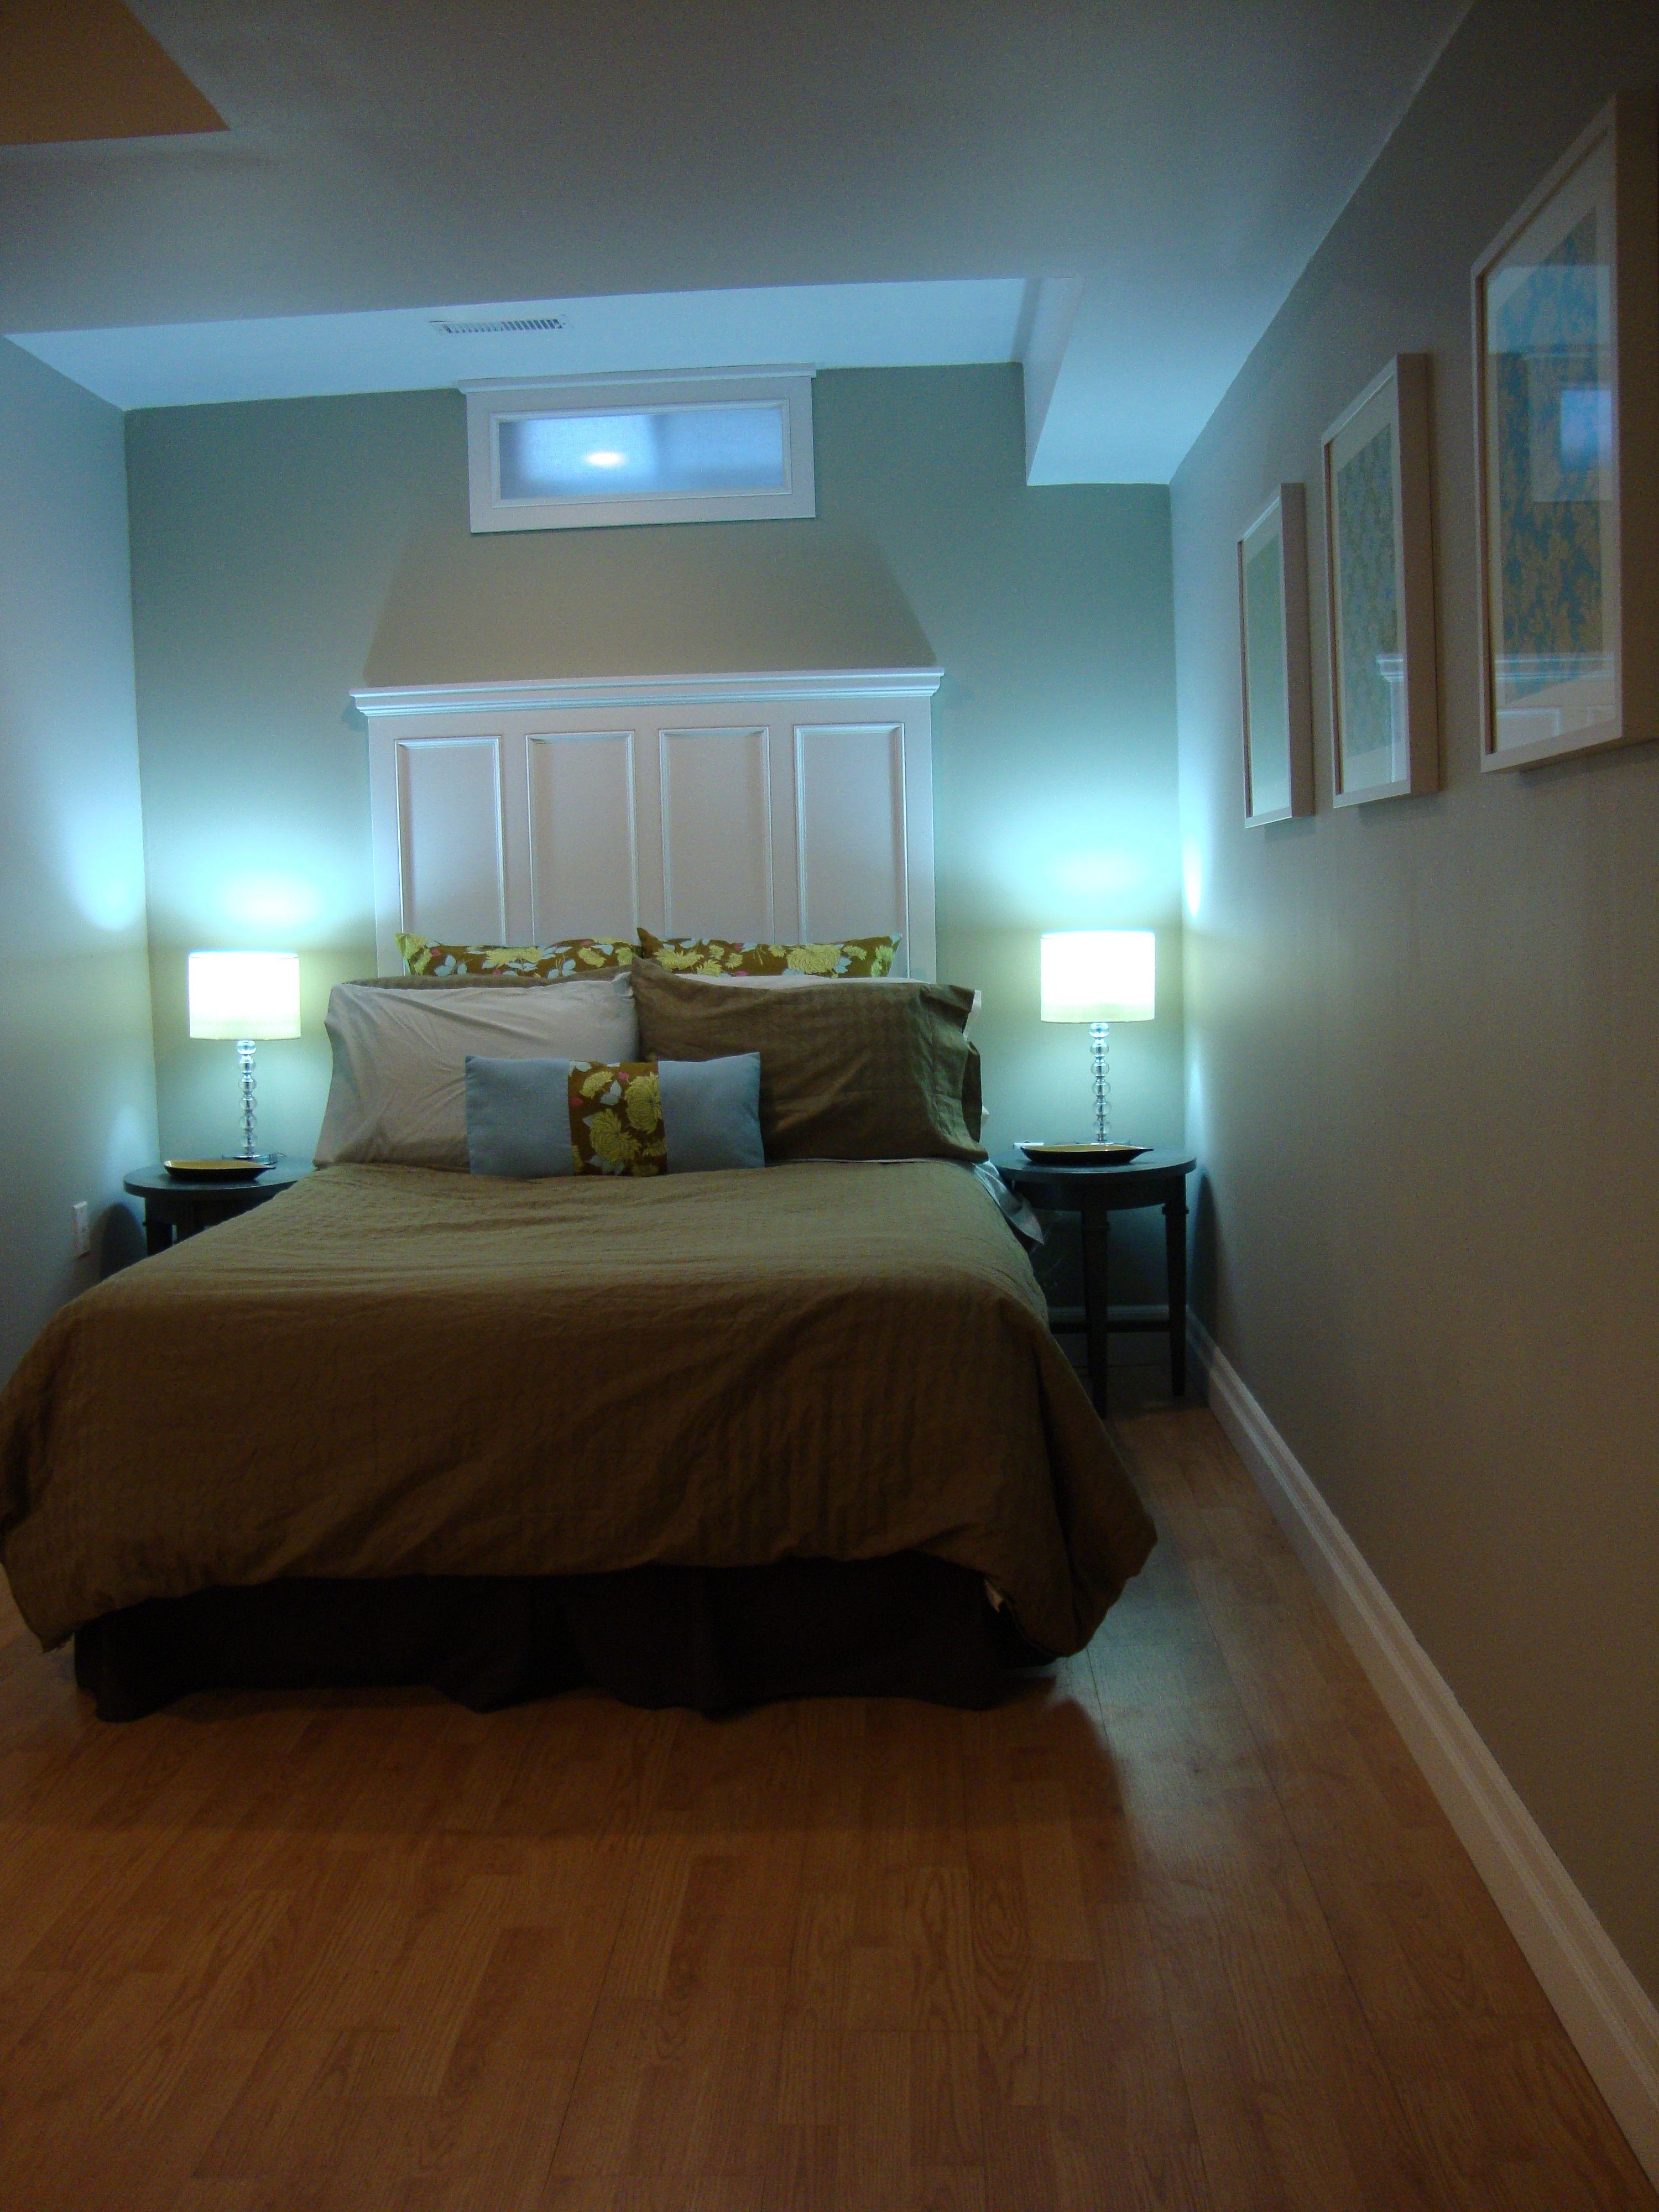 Clean simple basement guest bedroom. Headboard. Blue